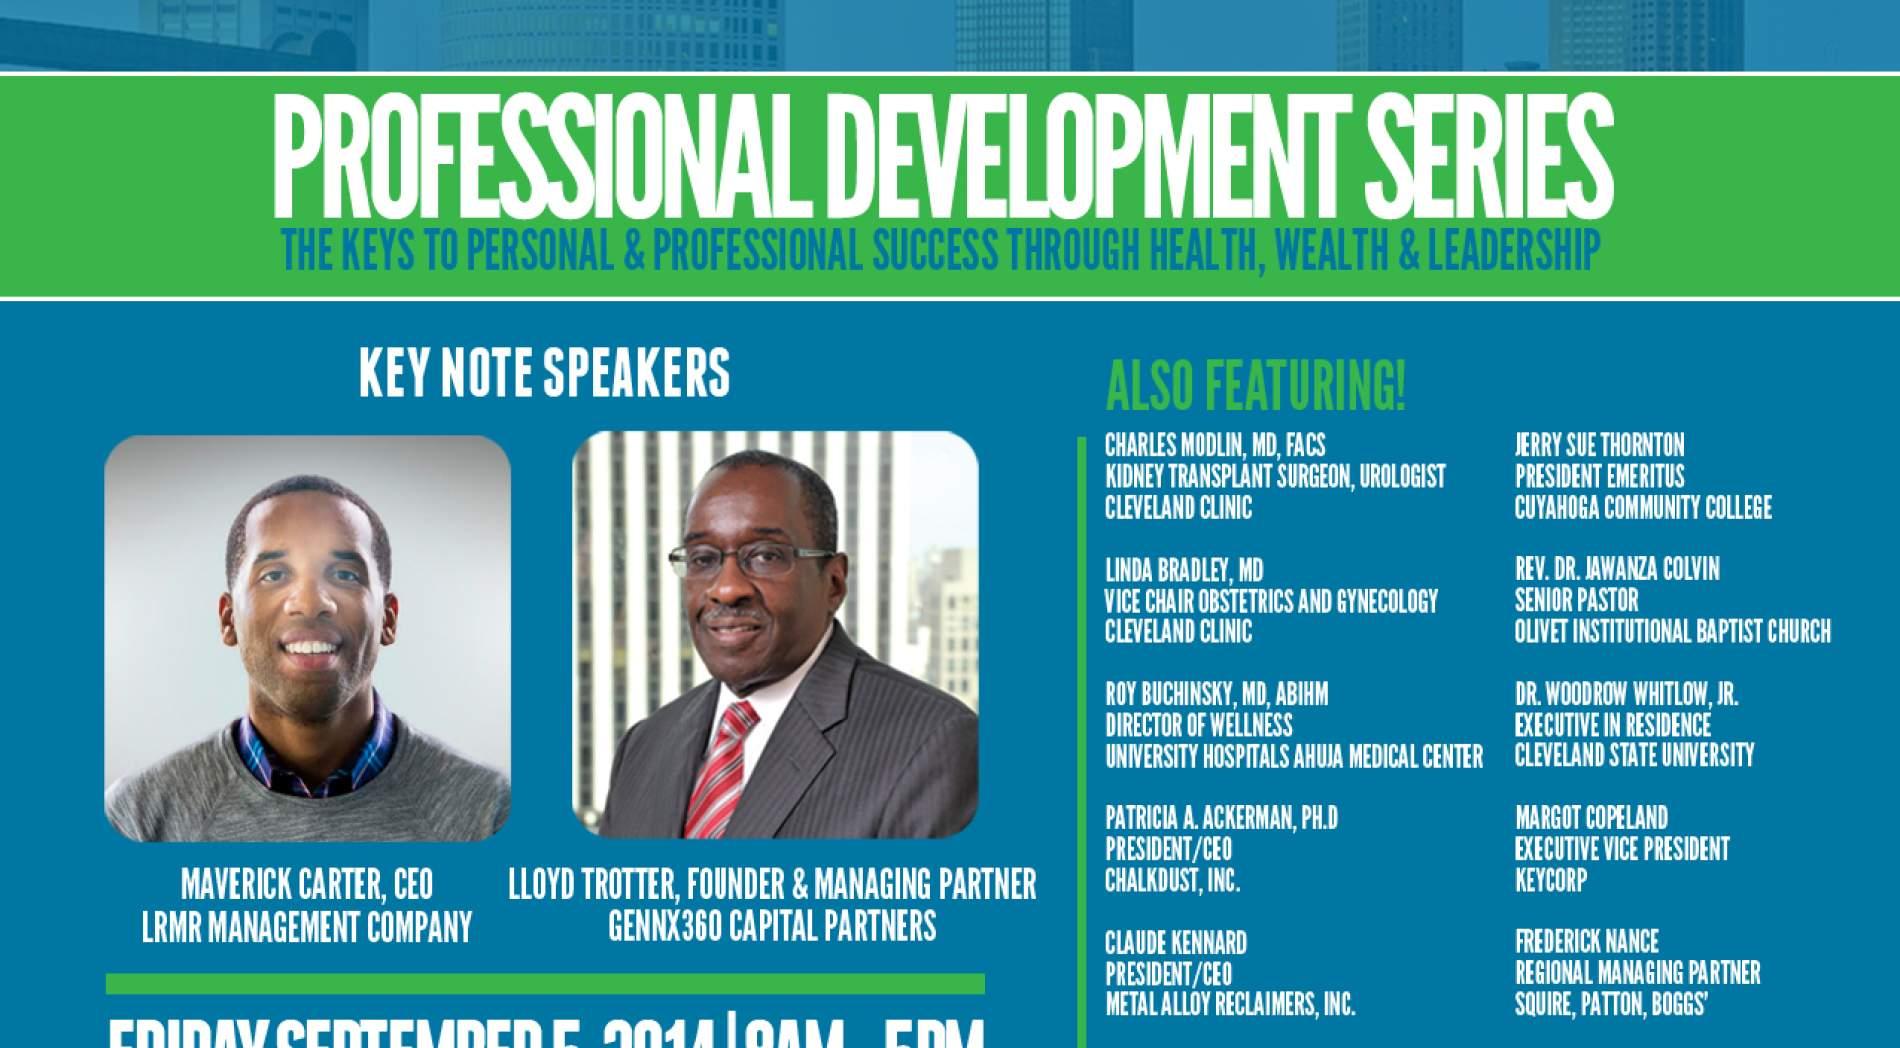 9ec60f4bce92 Jeffrey Wasserman to speak at the Tau Boule Professional Development Series